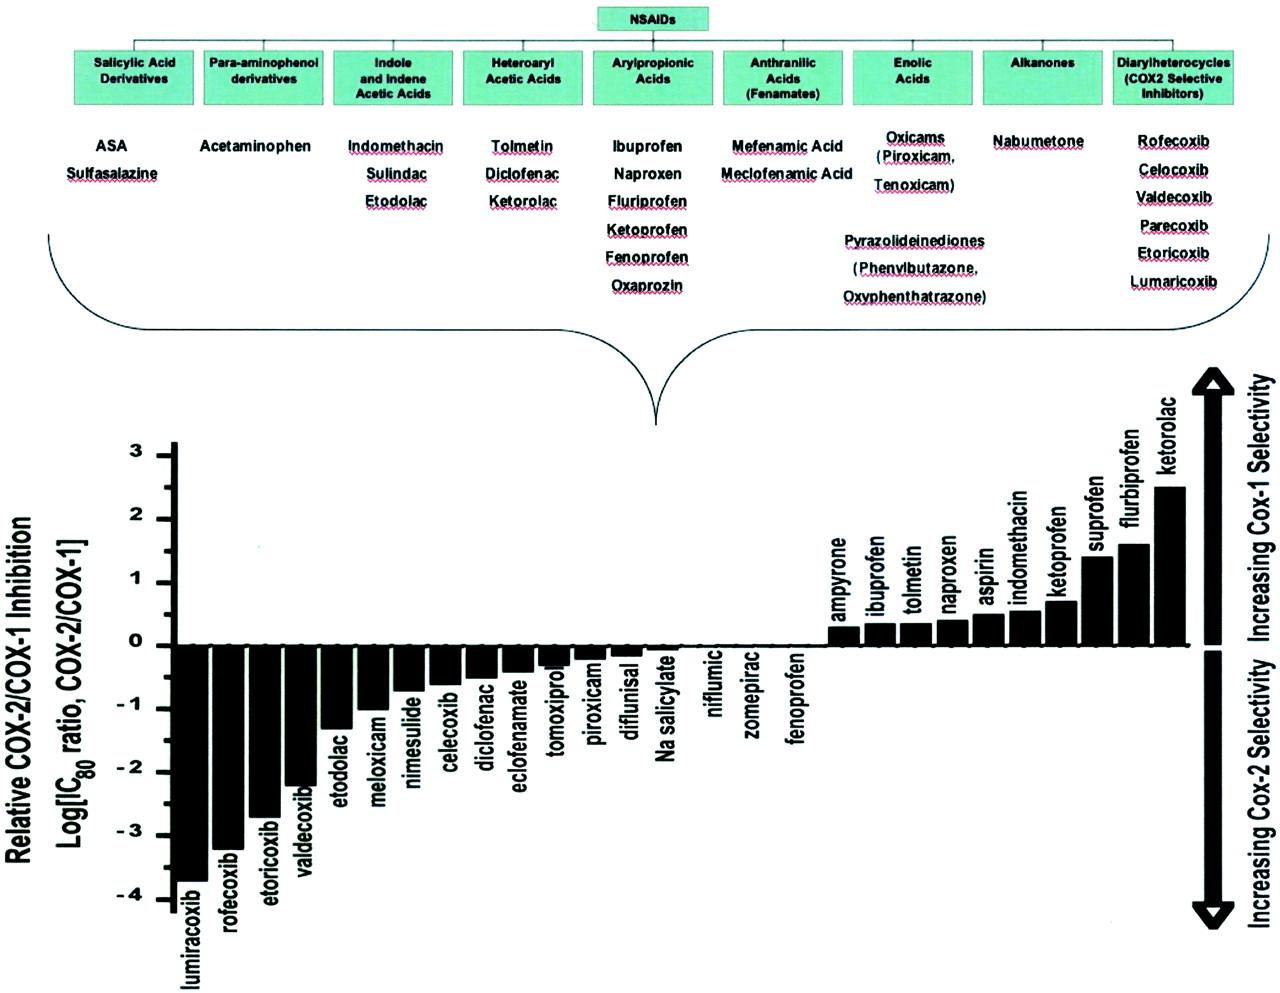 nsaid potency chart nsaid potency chart happy now tk